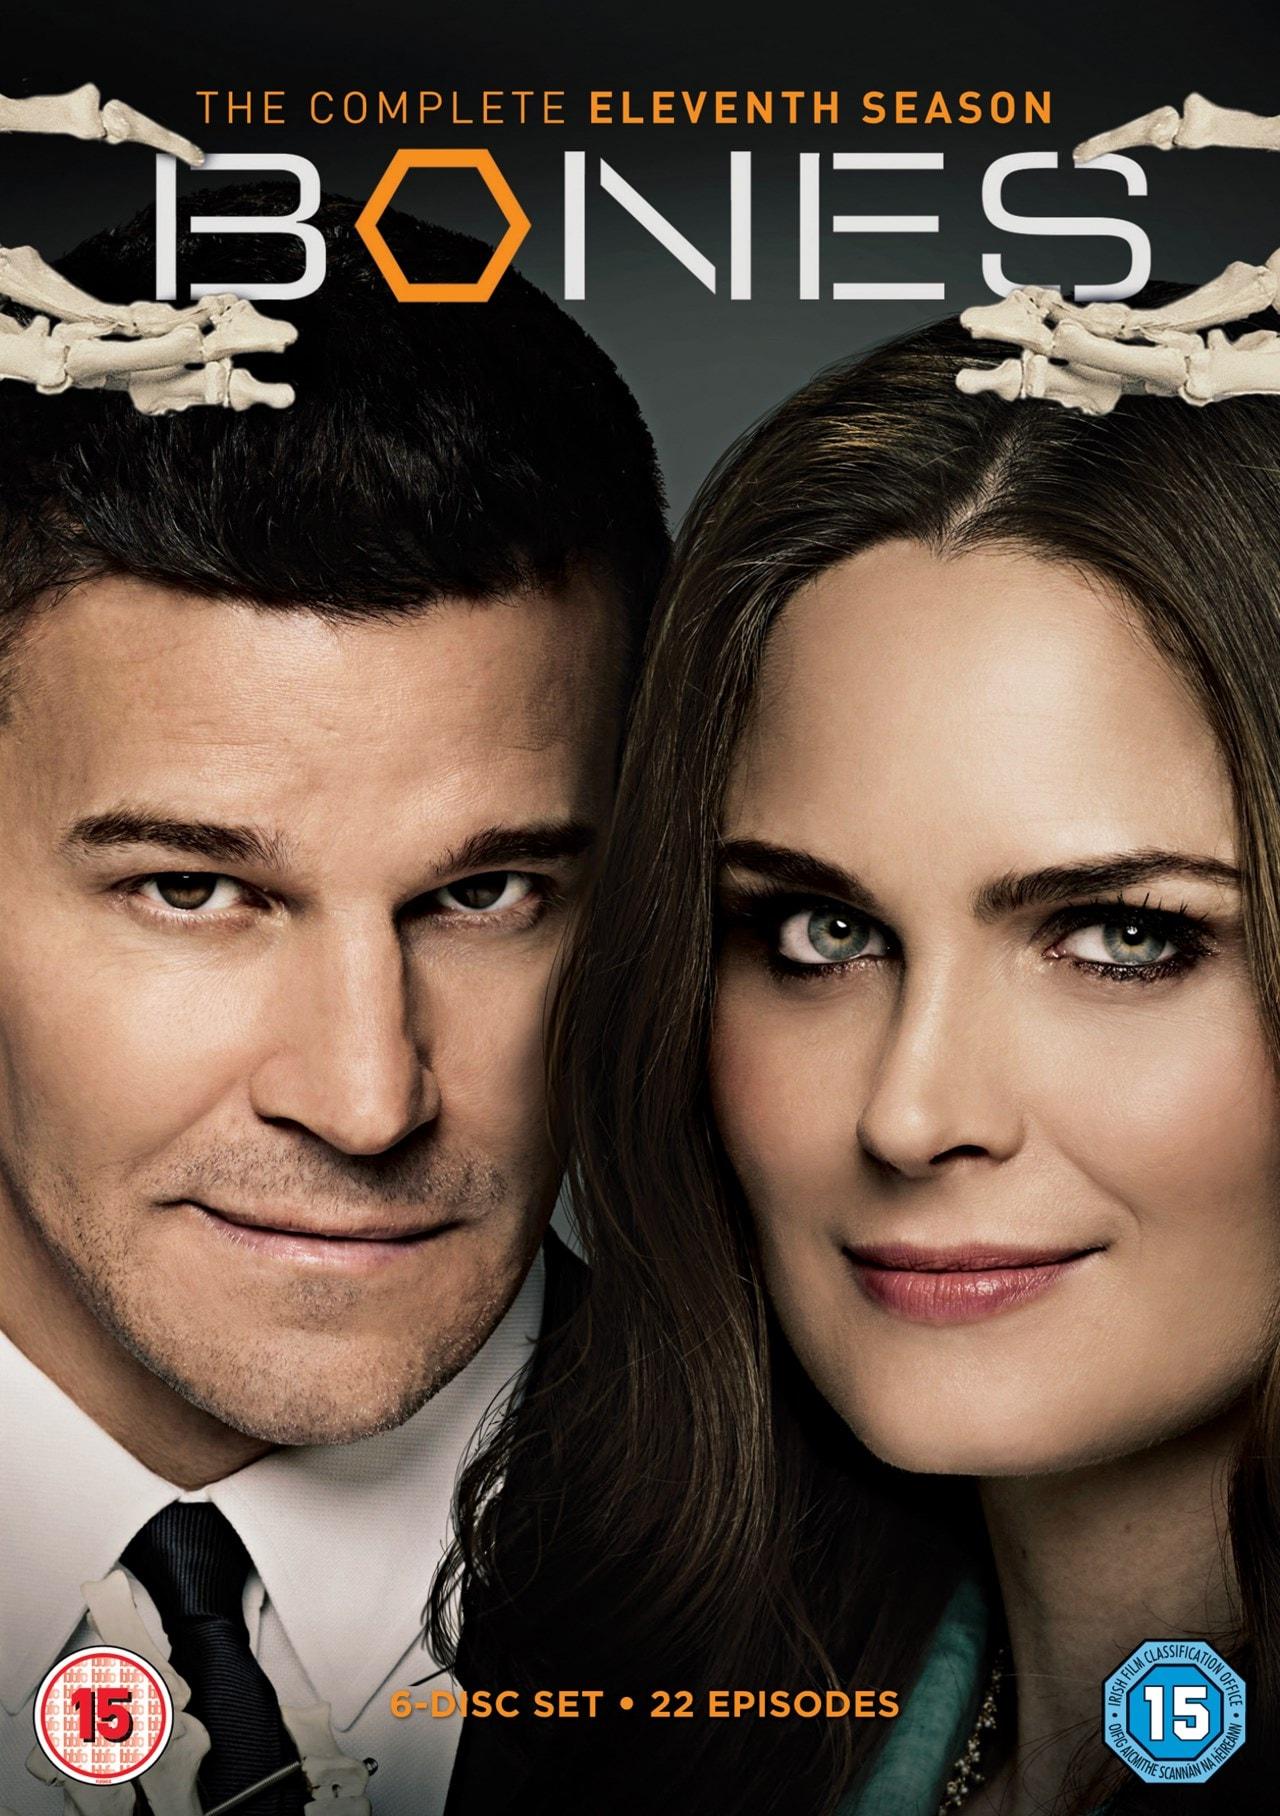 Bones: The Complete Eleventh Season - 1